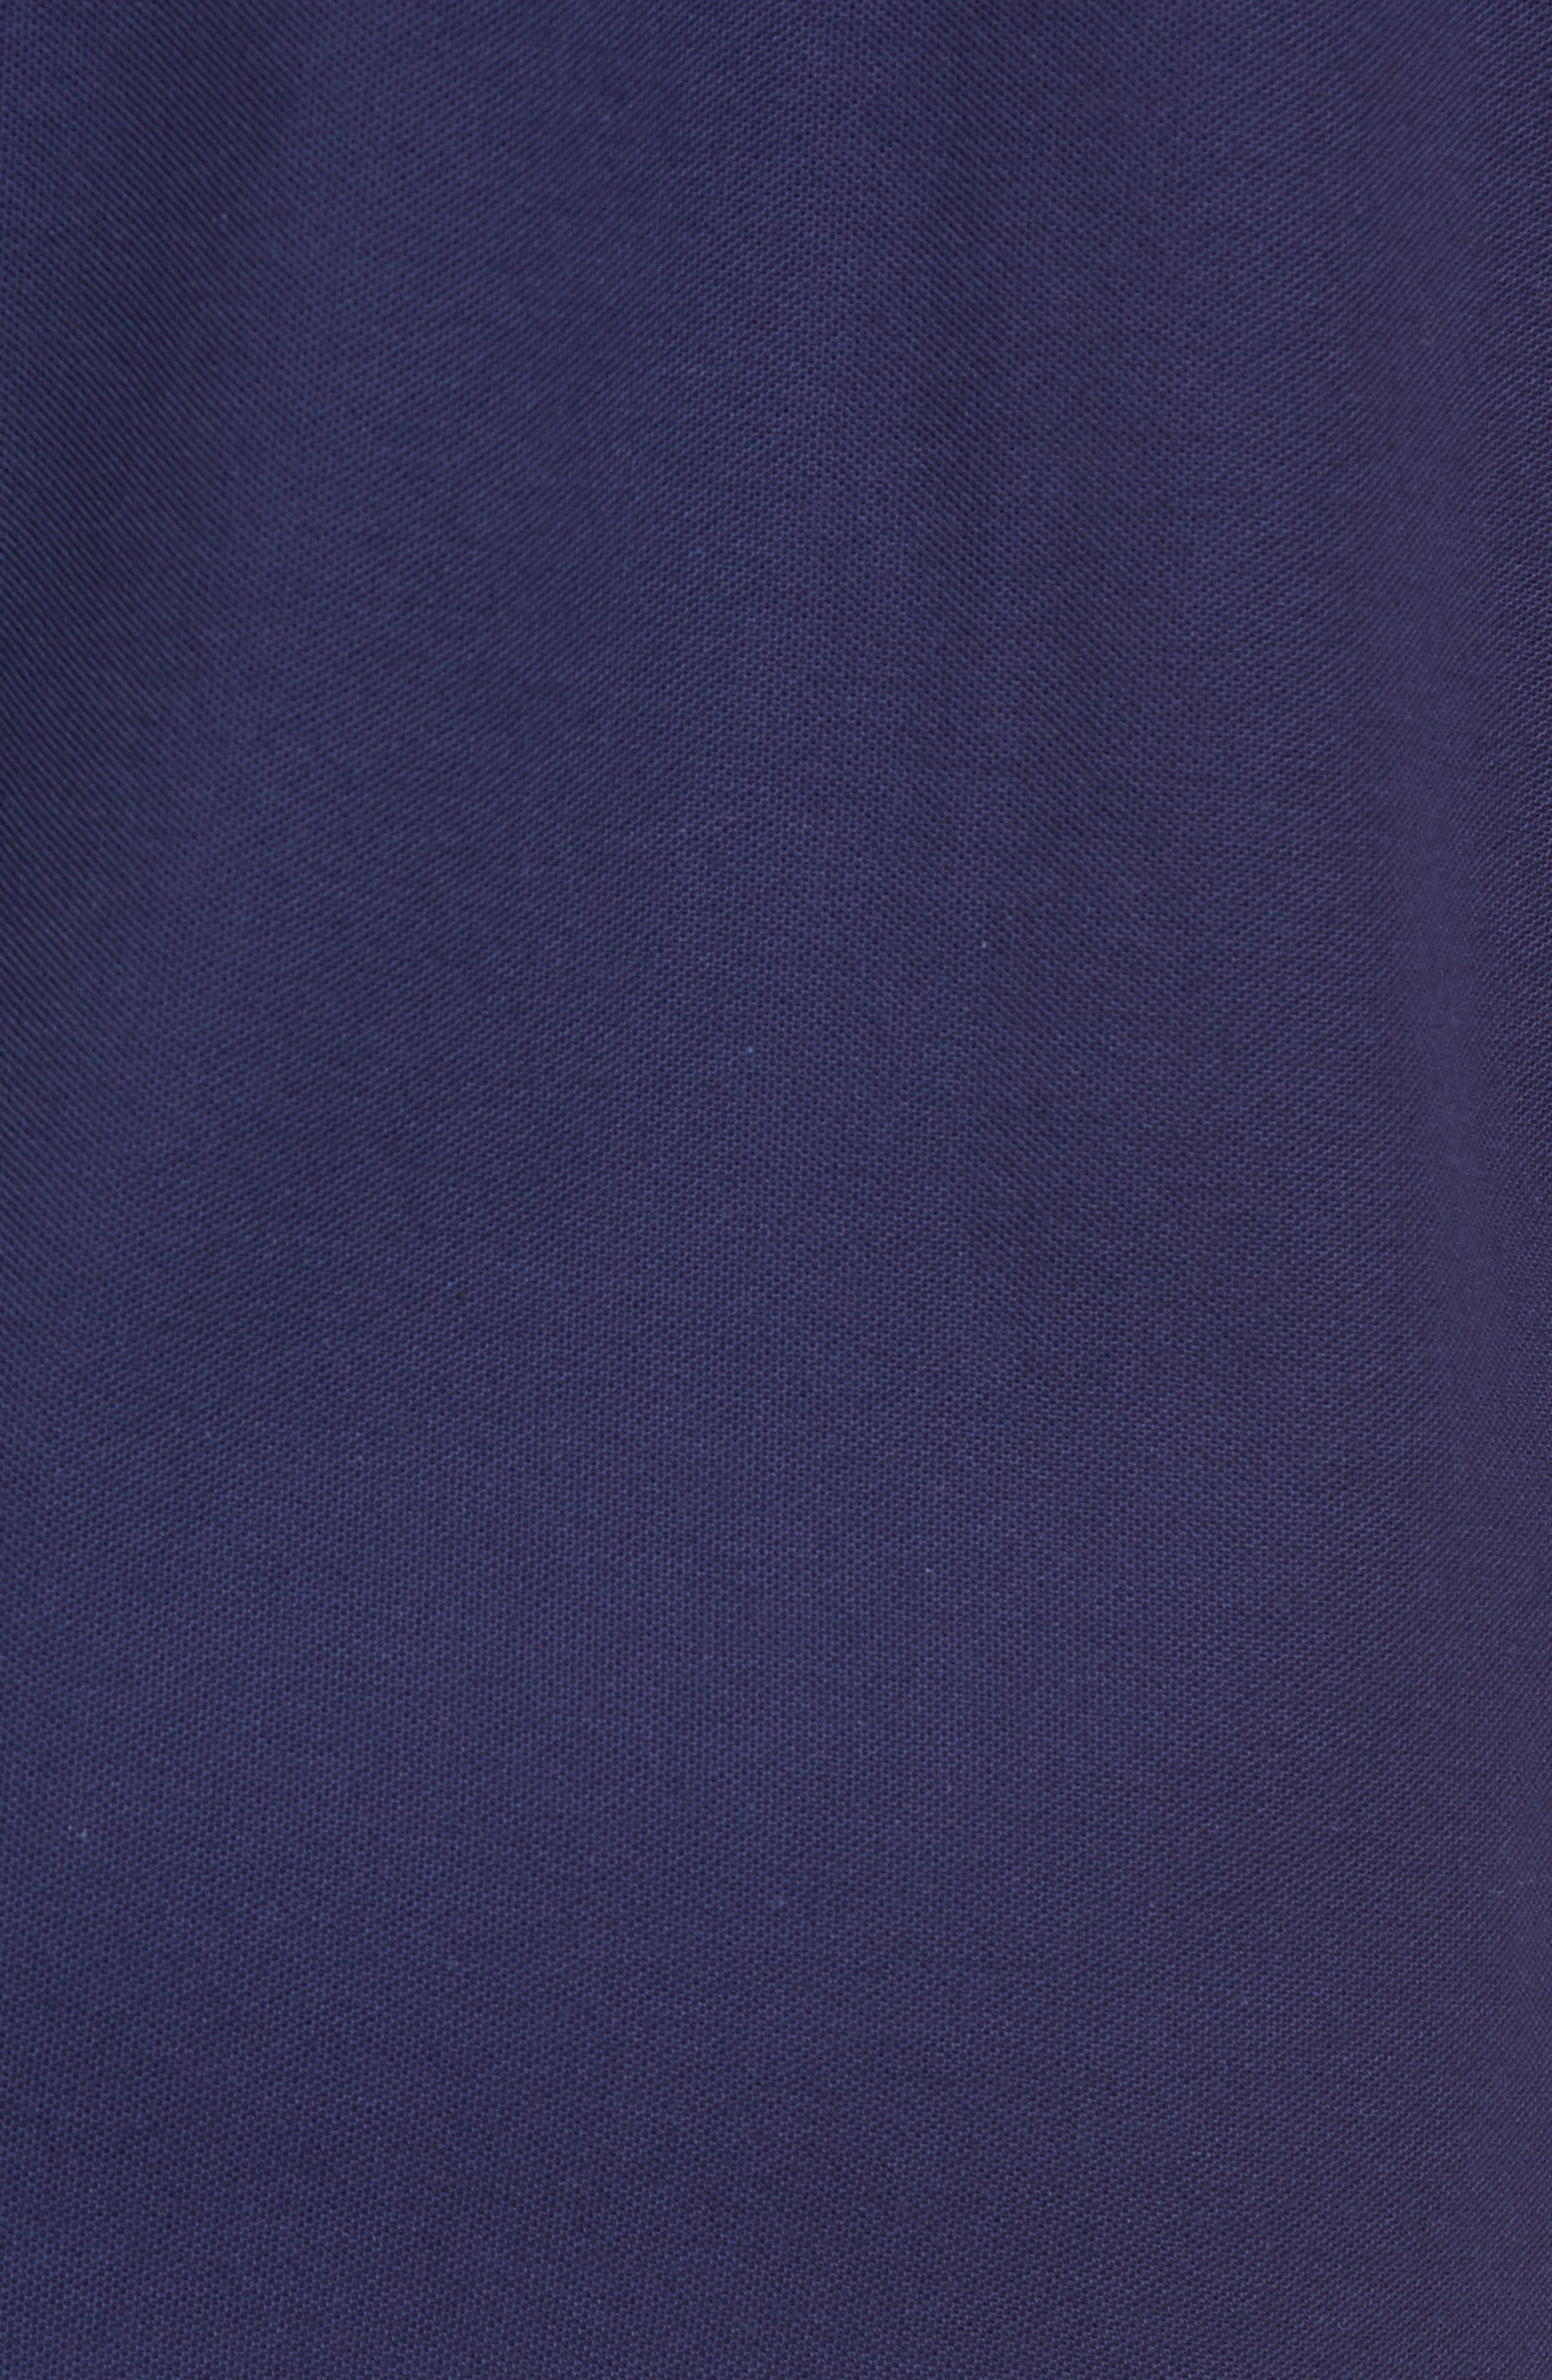 Alternate Image 5  - Zachary Prell Palmetto Pima Cotton Shirt